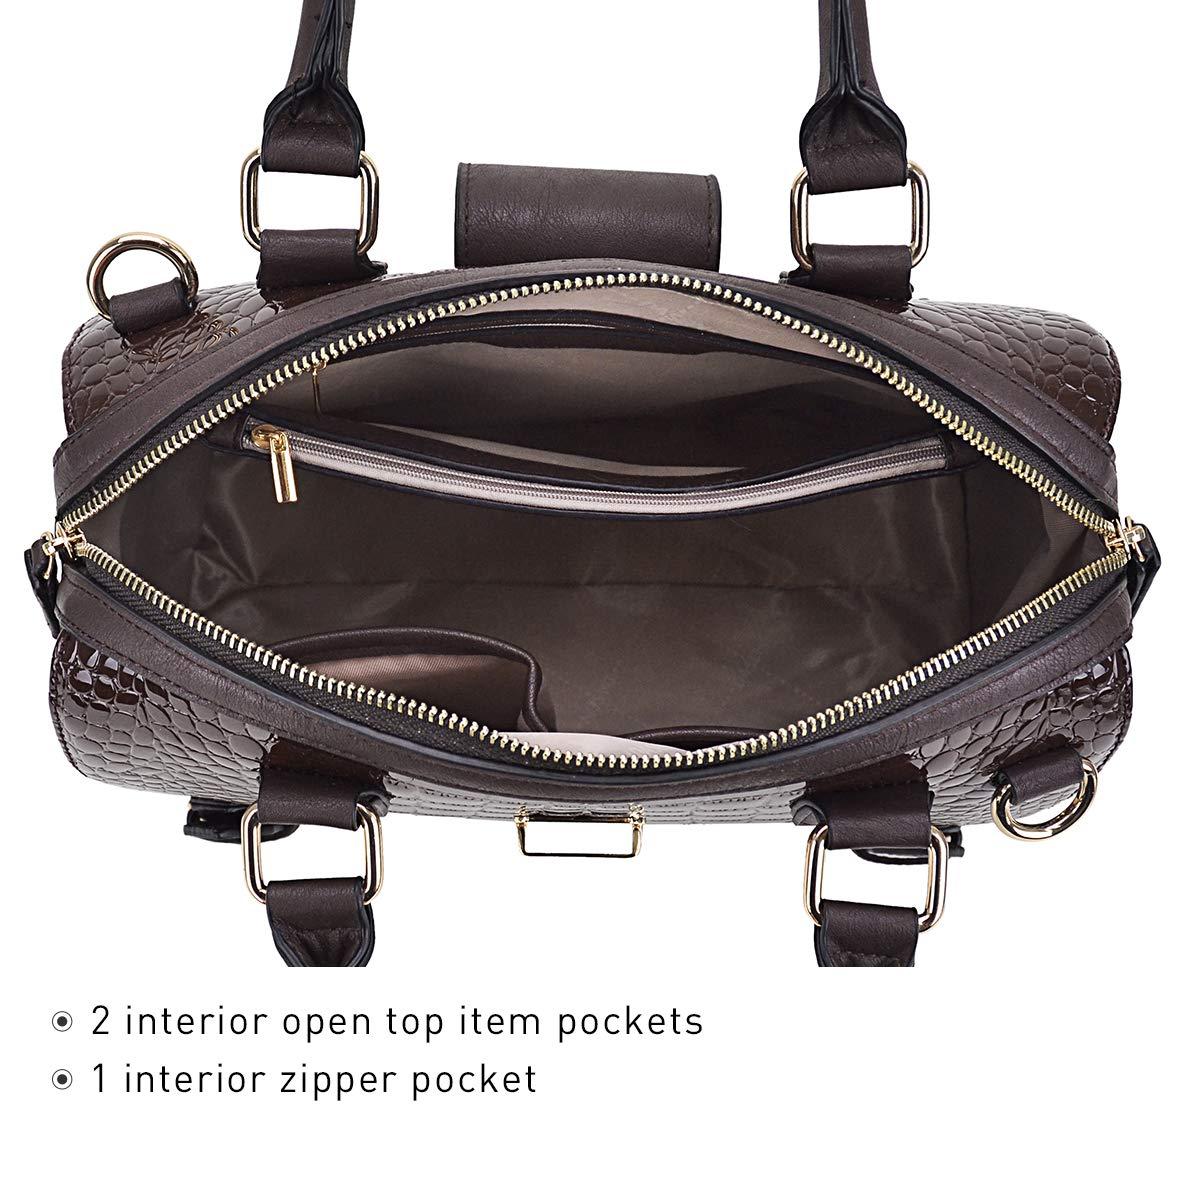 Dasein Women Barrel Handbags Purses Fashion Satchel Bags Top Handle Shoulder Bags Vegan Leather Tote Bags by Dasein (Image #6)